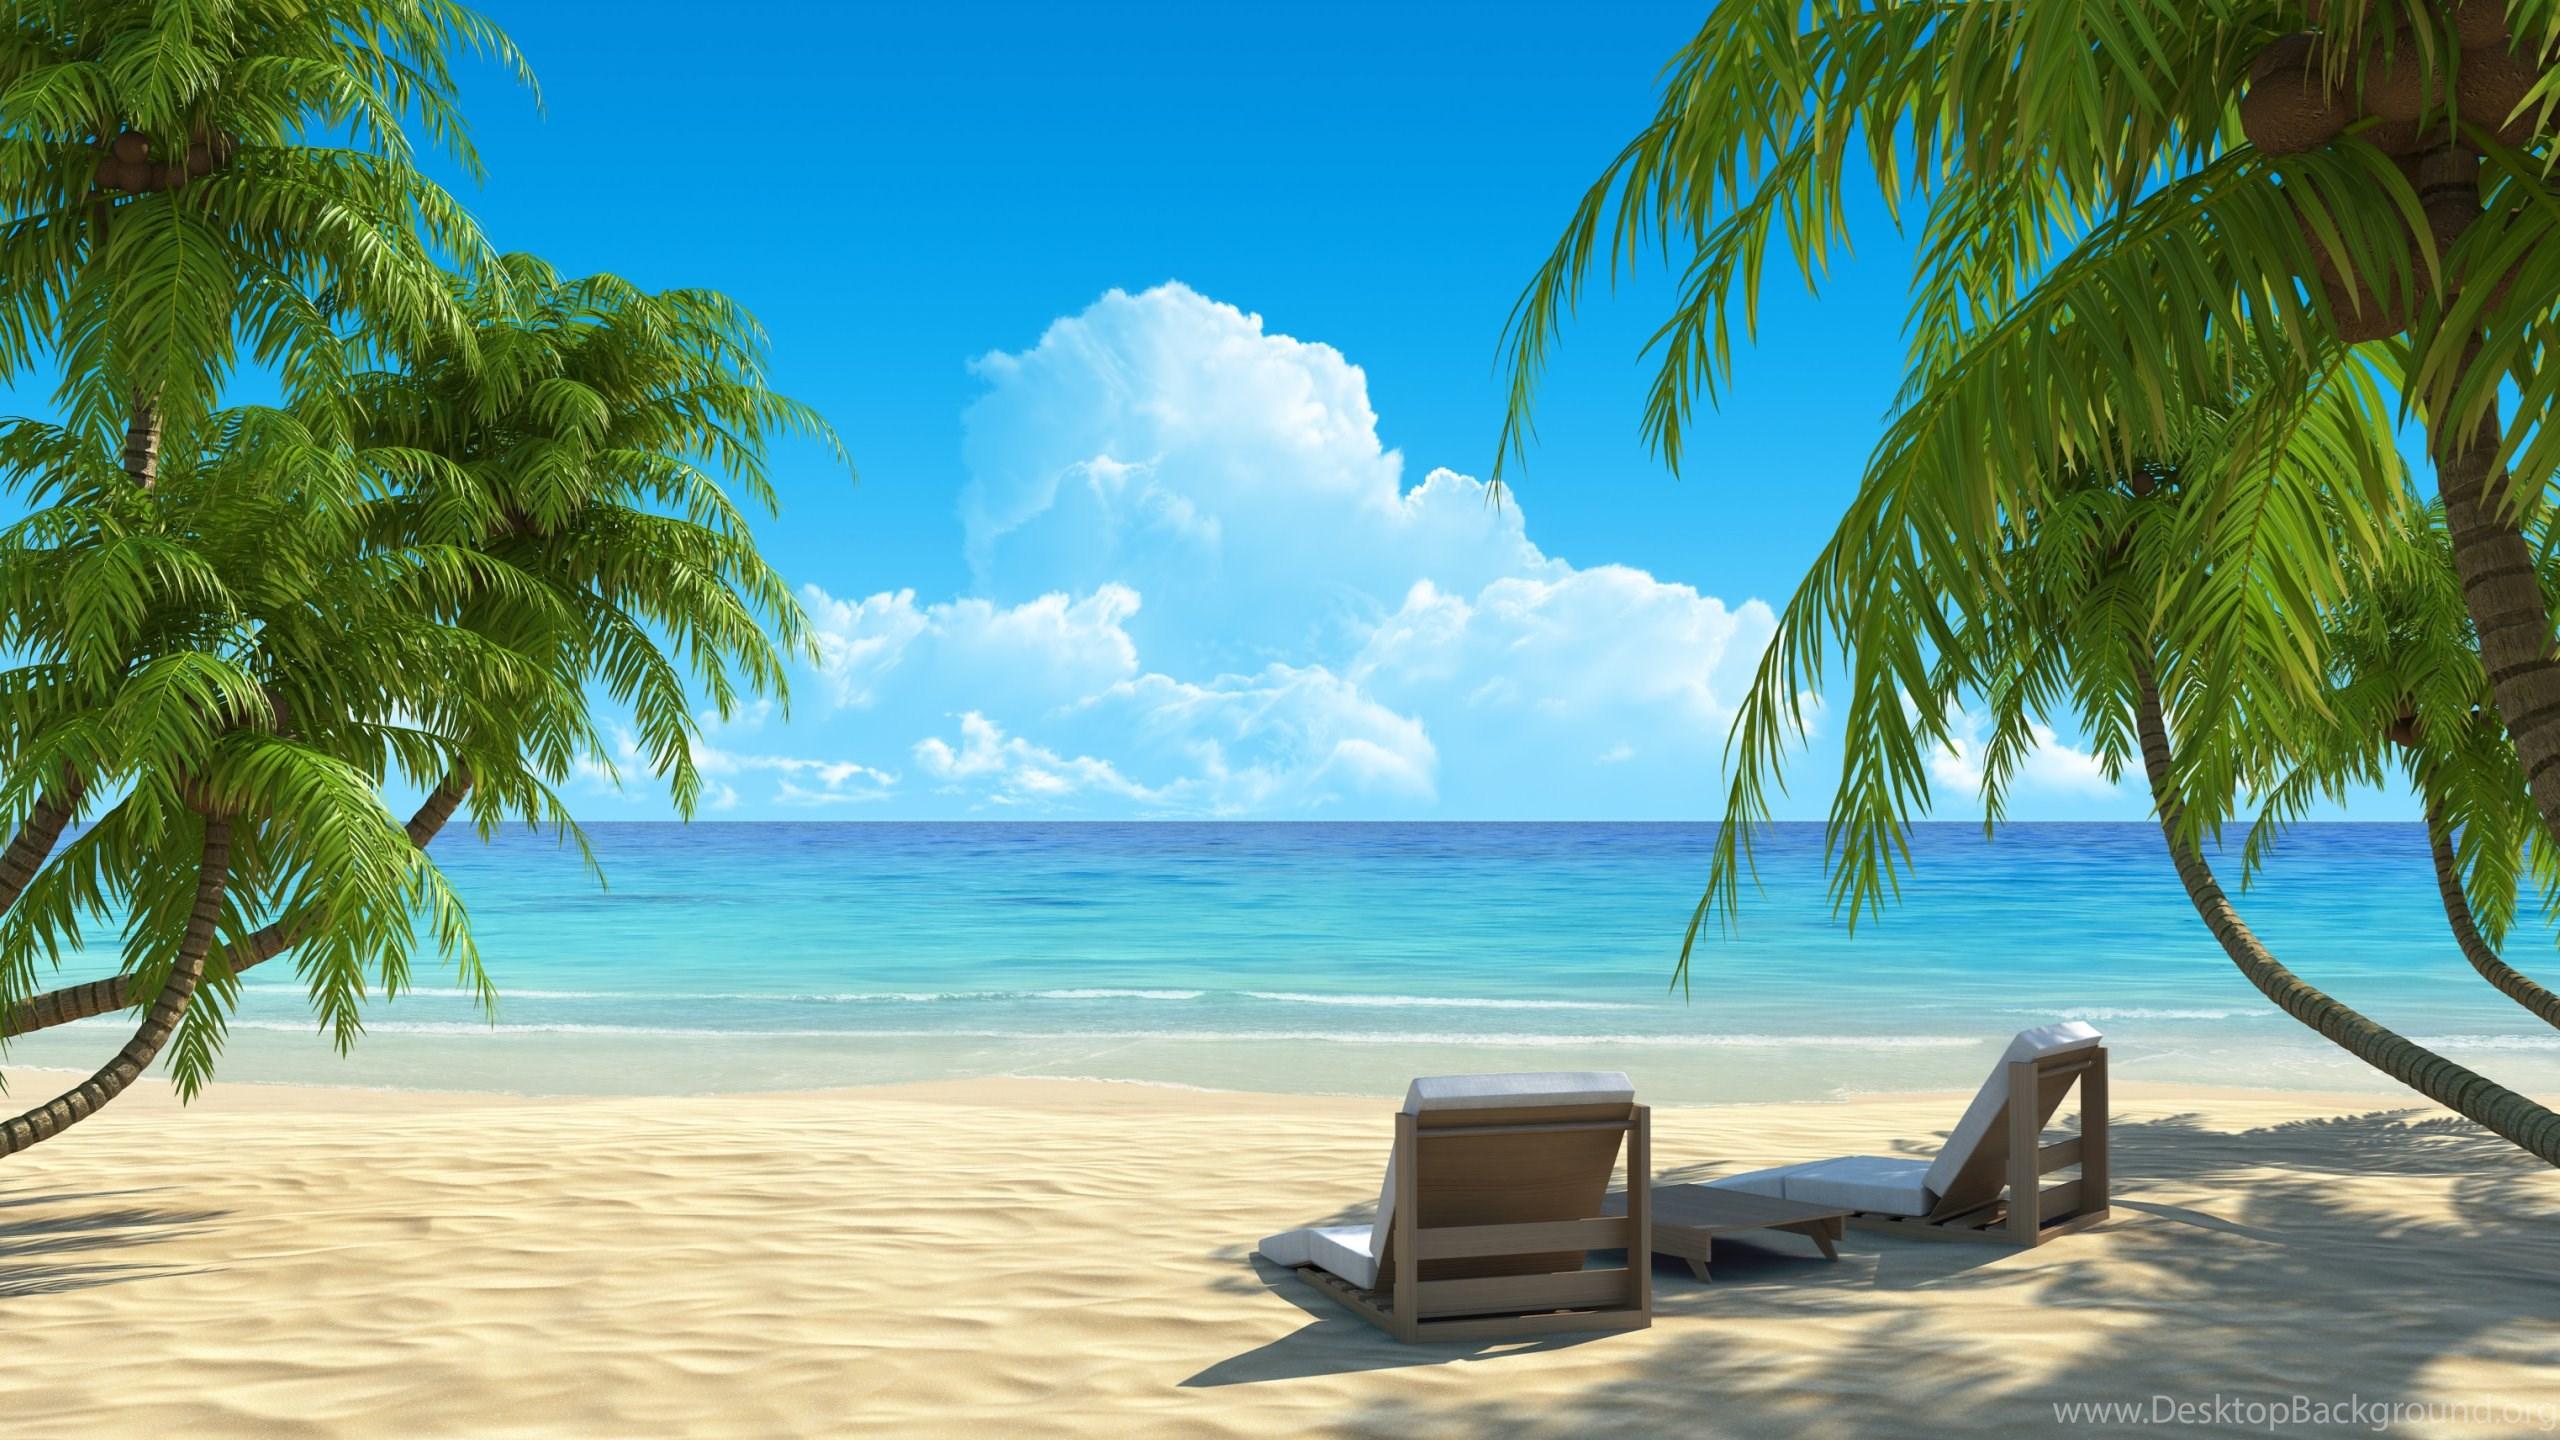 Tropical Paradise Beach Hd Wallpaper For Nexus 7 Screens: Belize Wallpapers Desktop Background